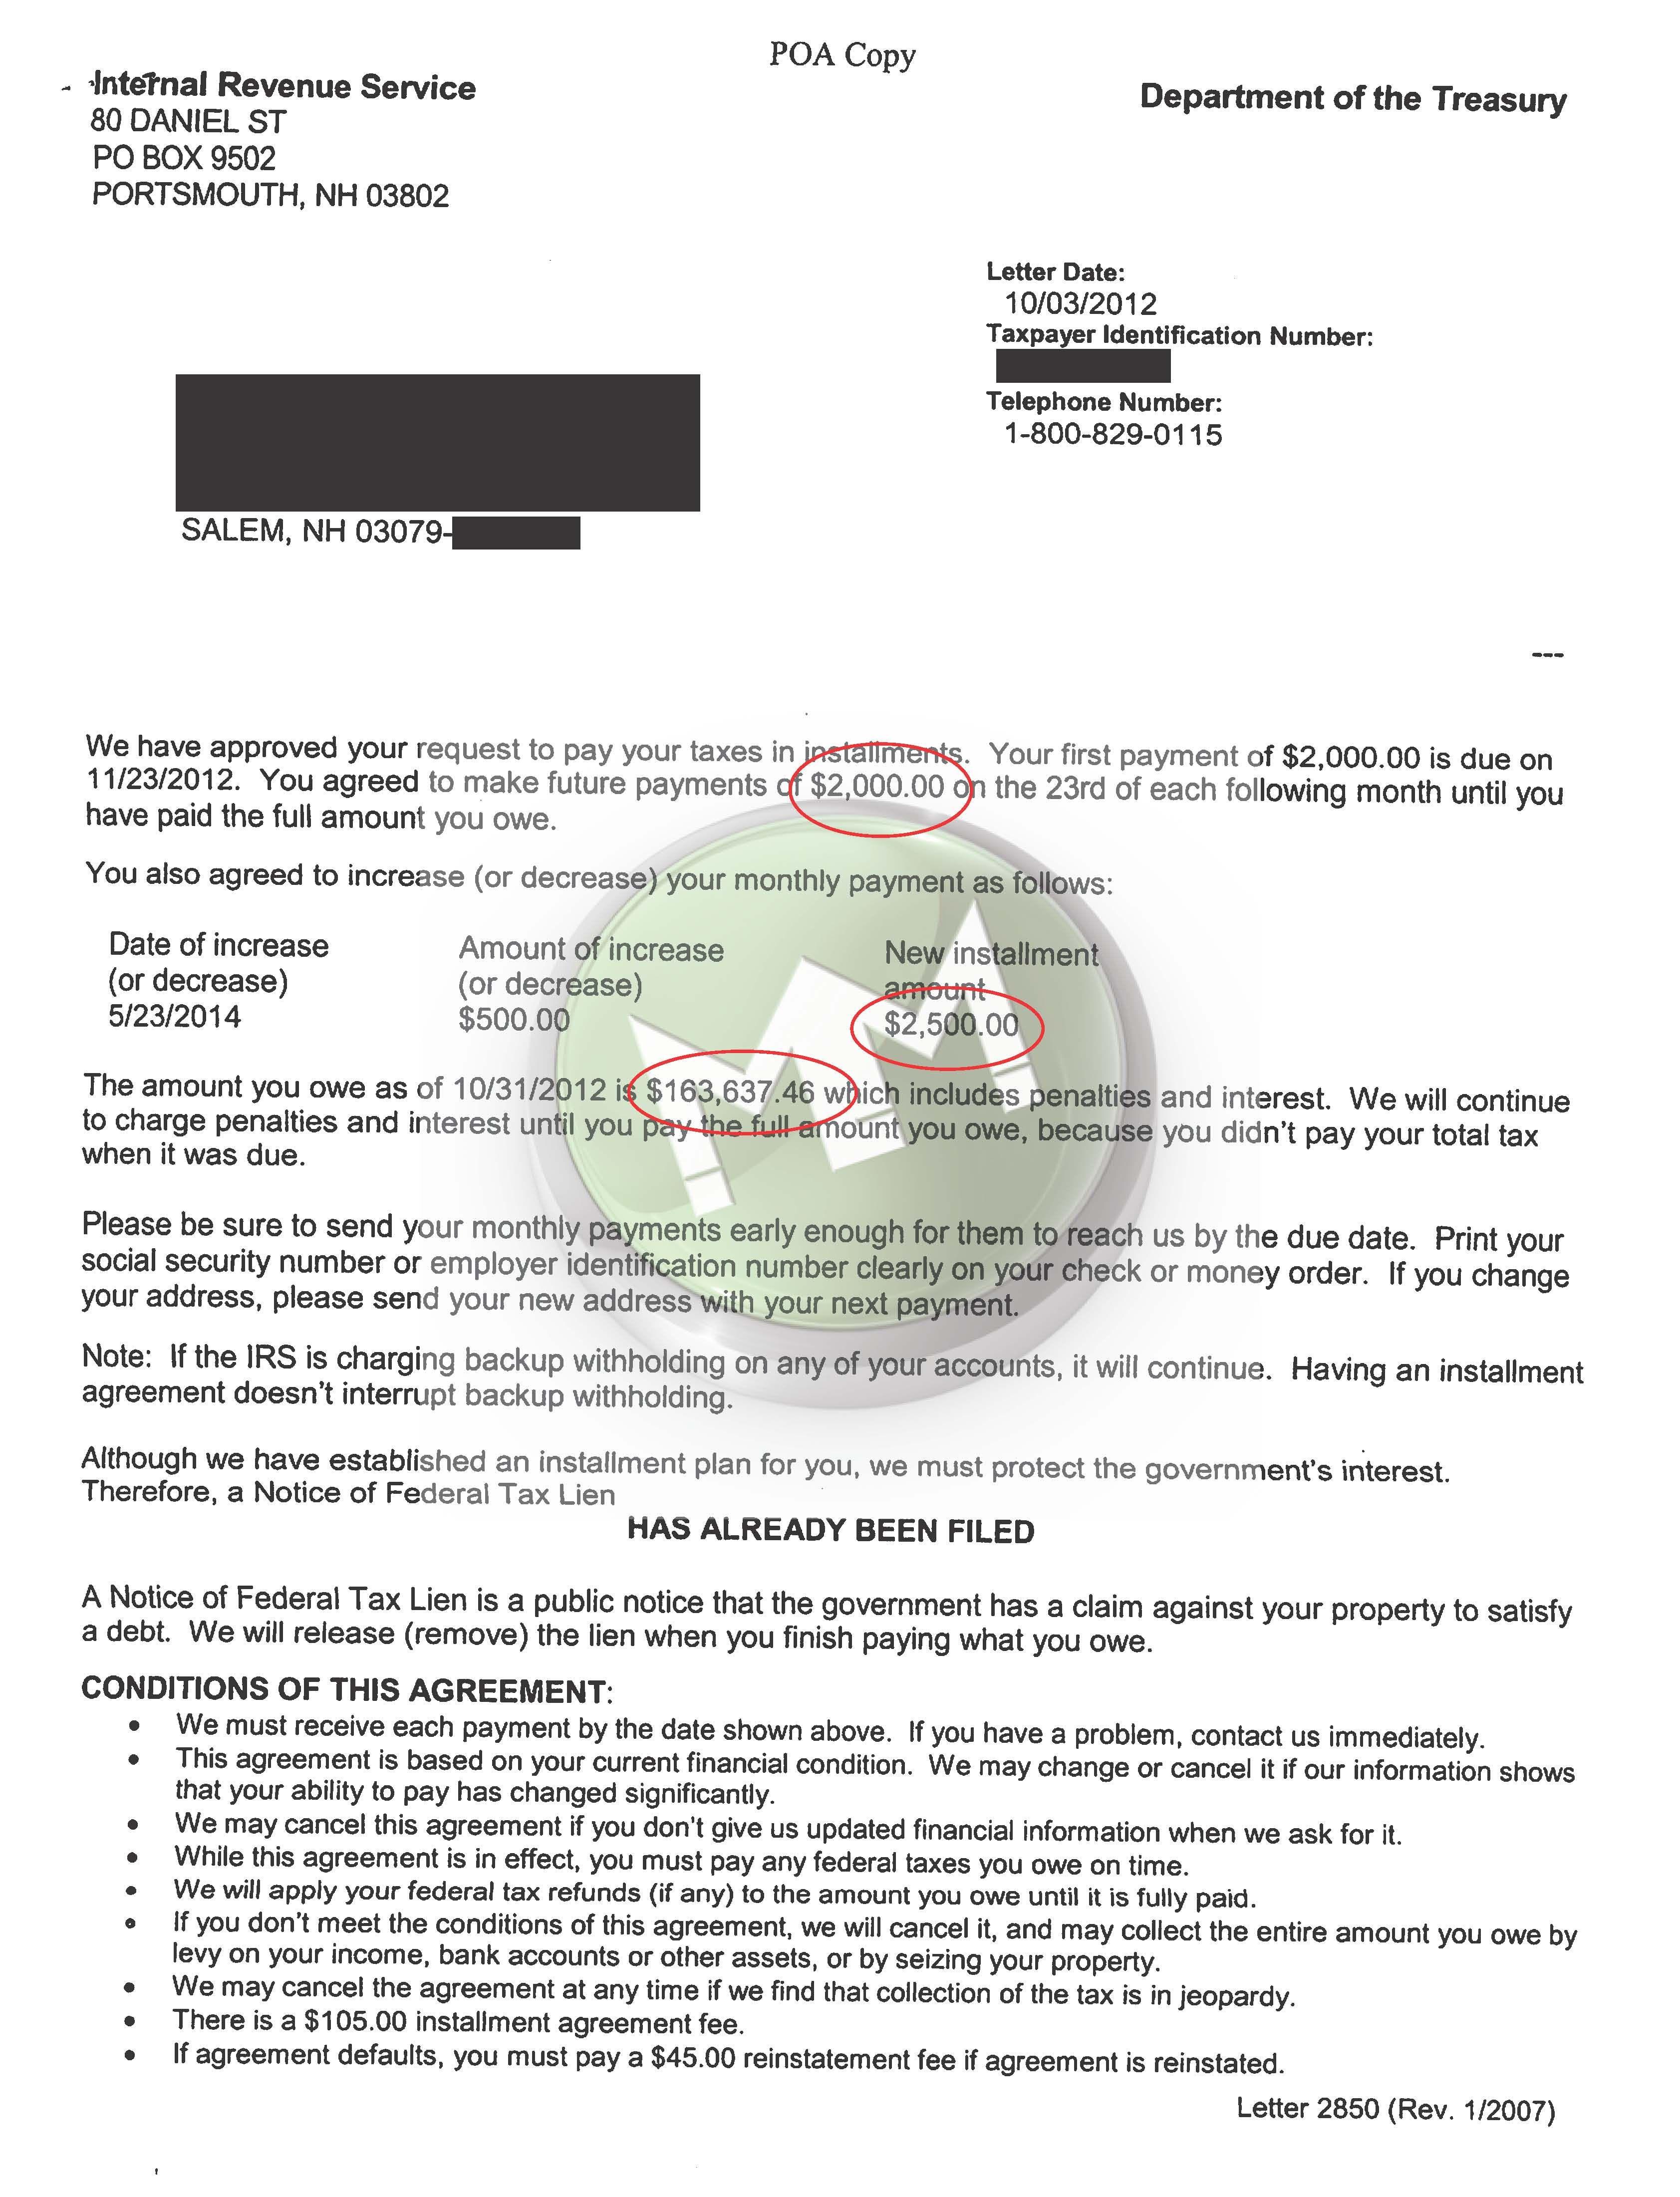 IRS Installment Agreement Salem, NH MM Financial